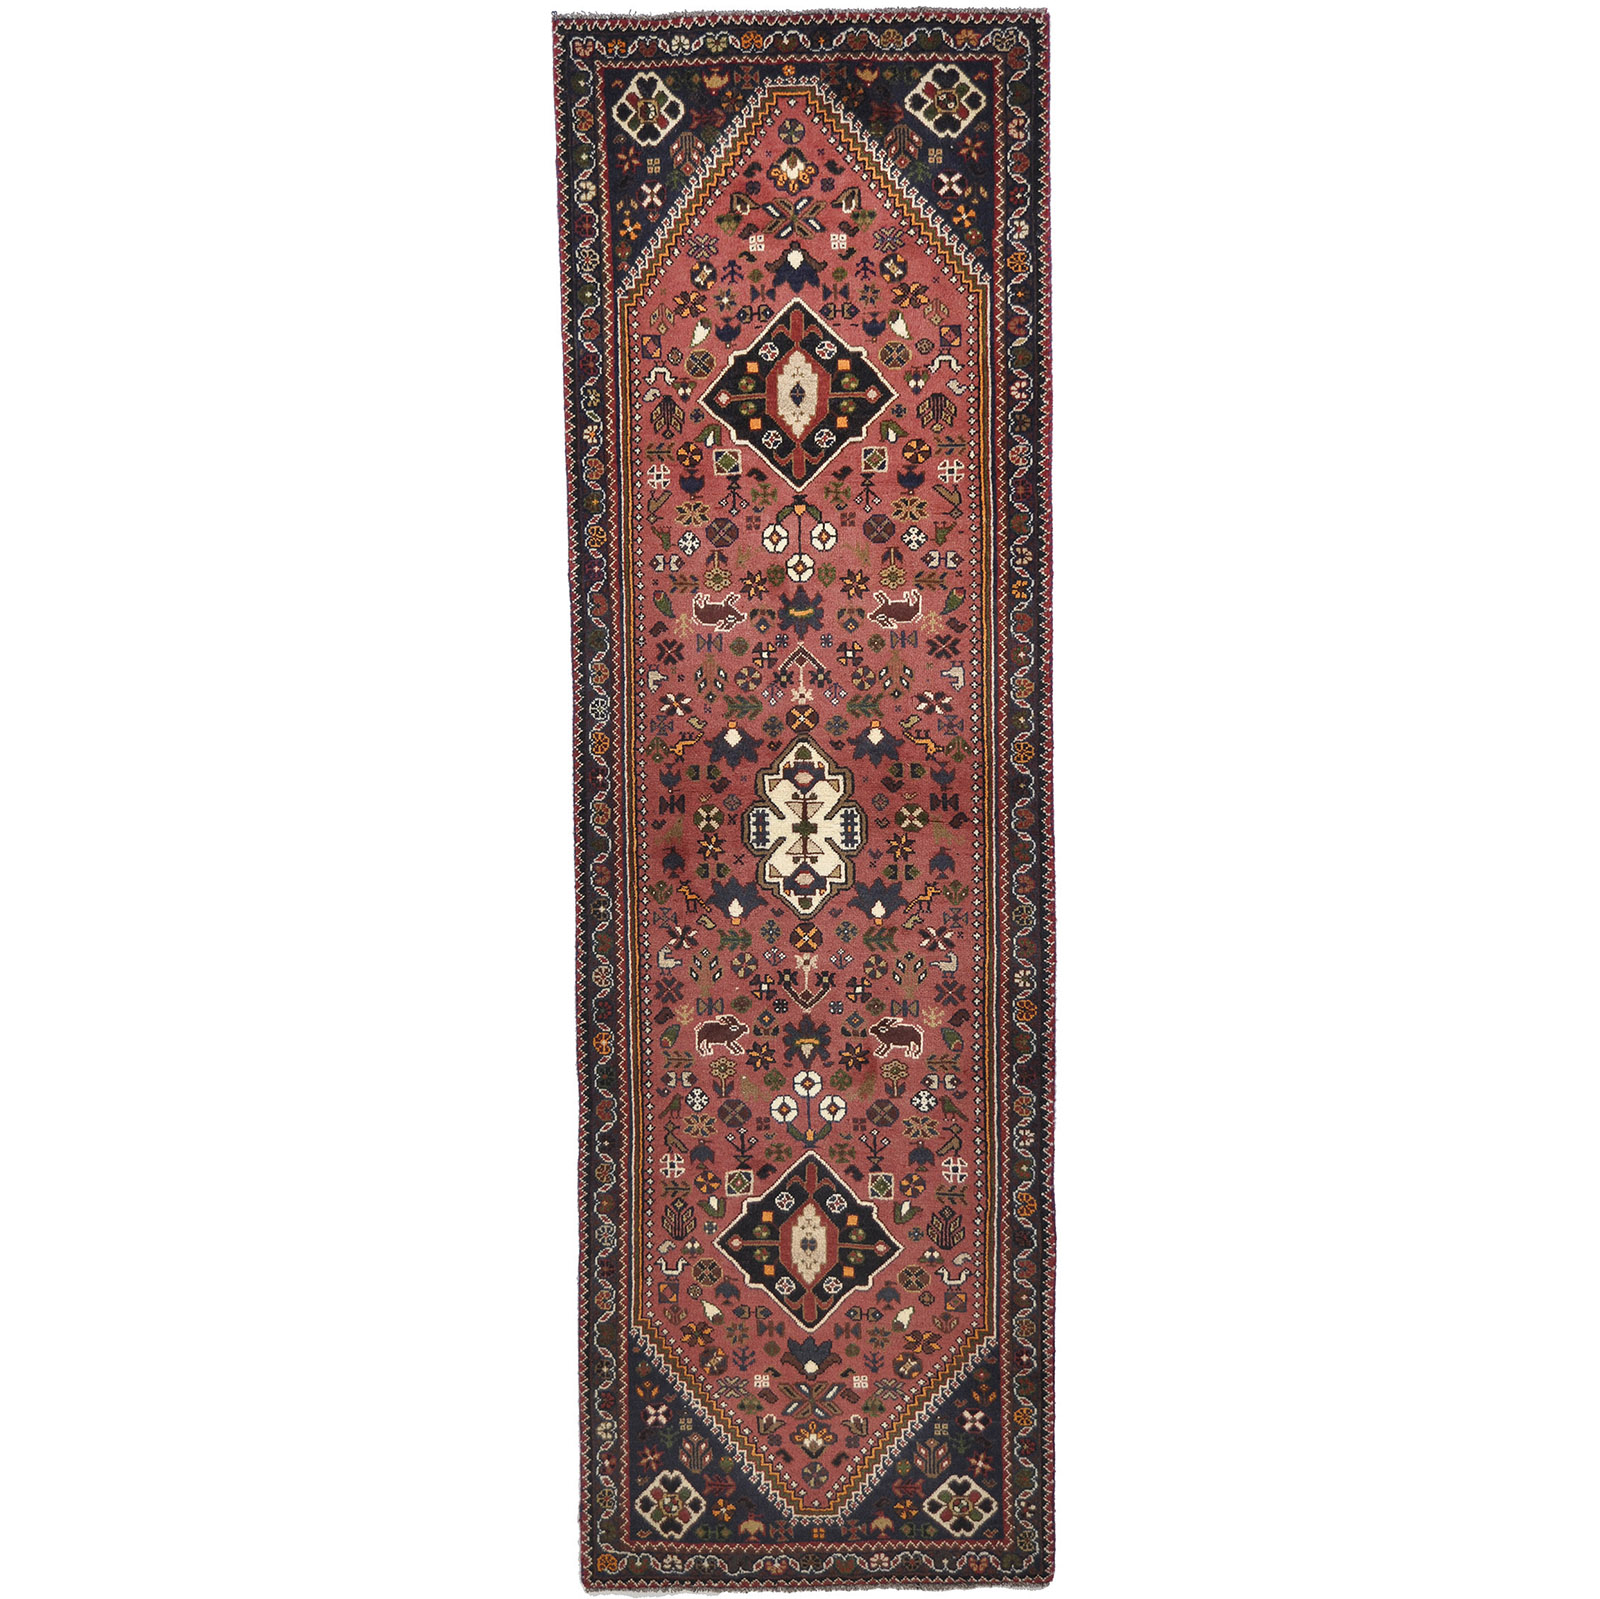 Ghasqai matta storlek 290x89 cm